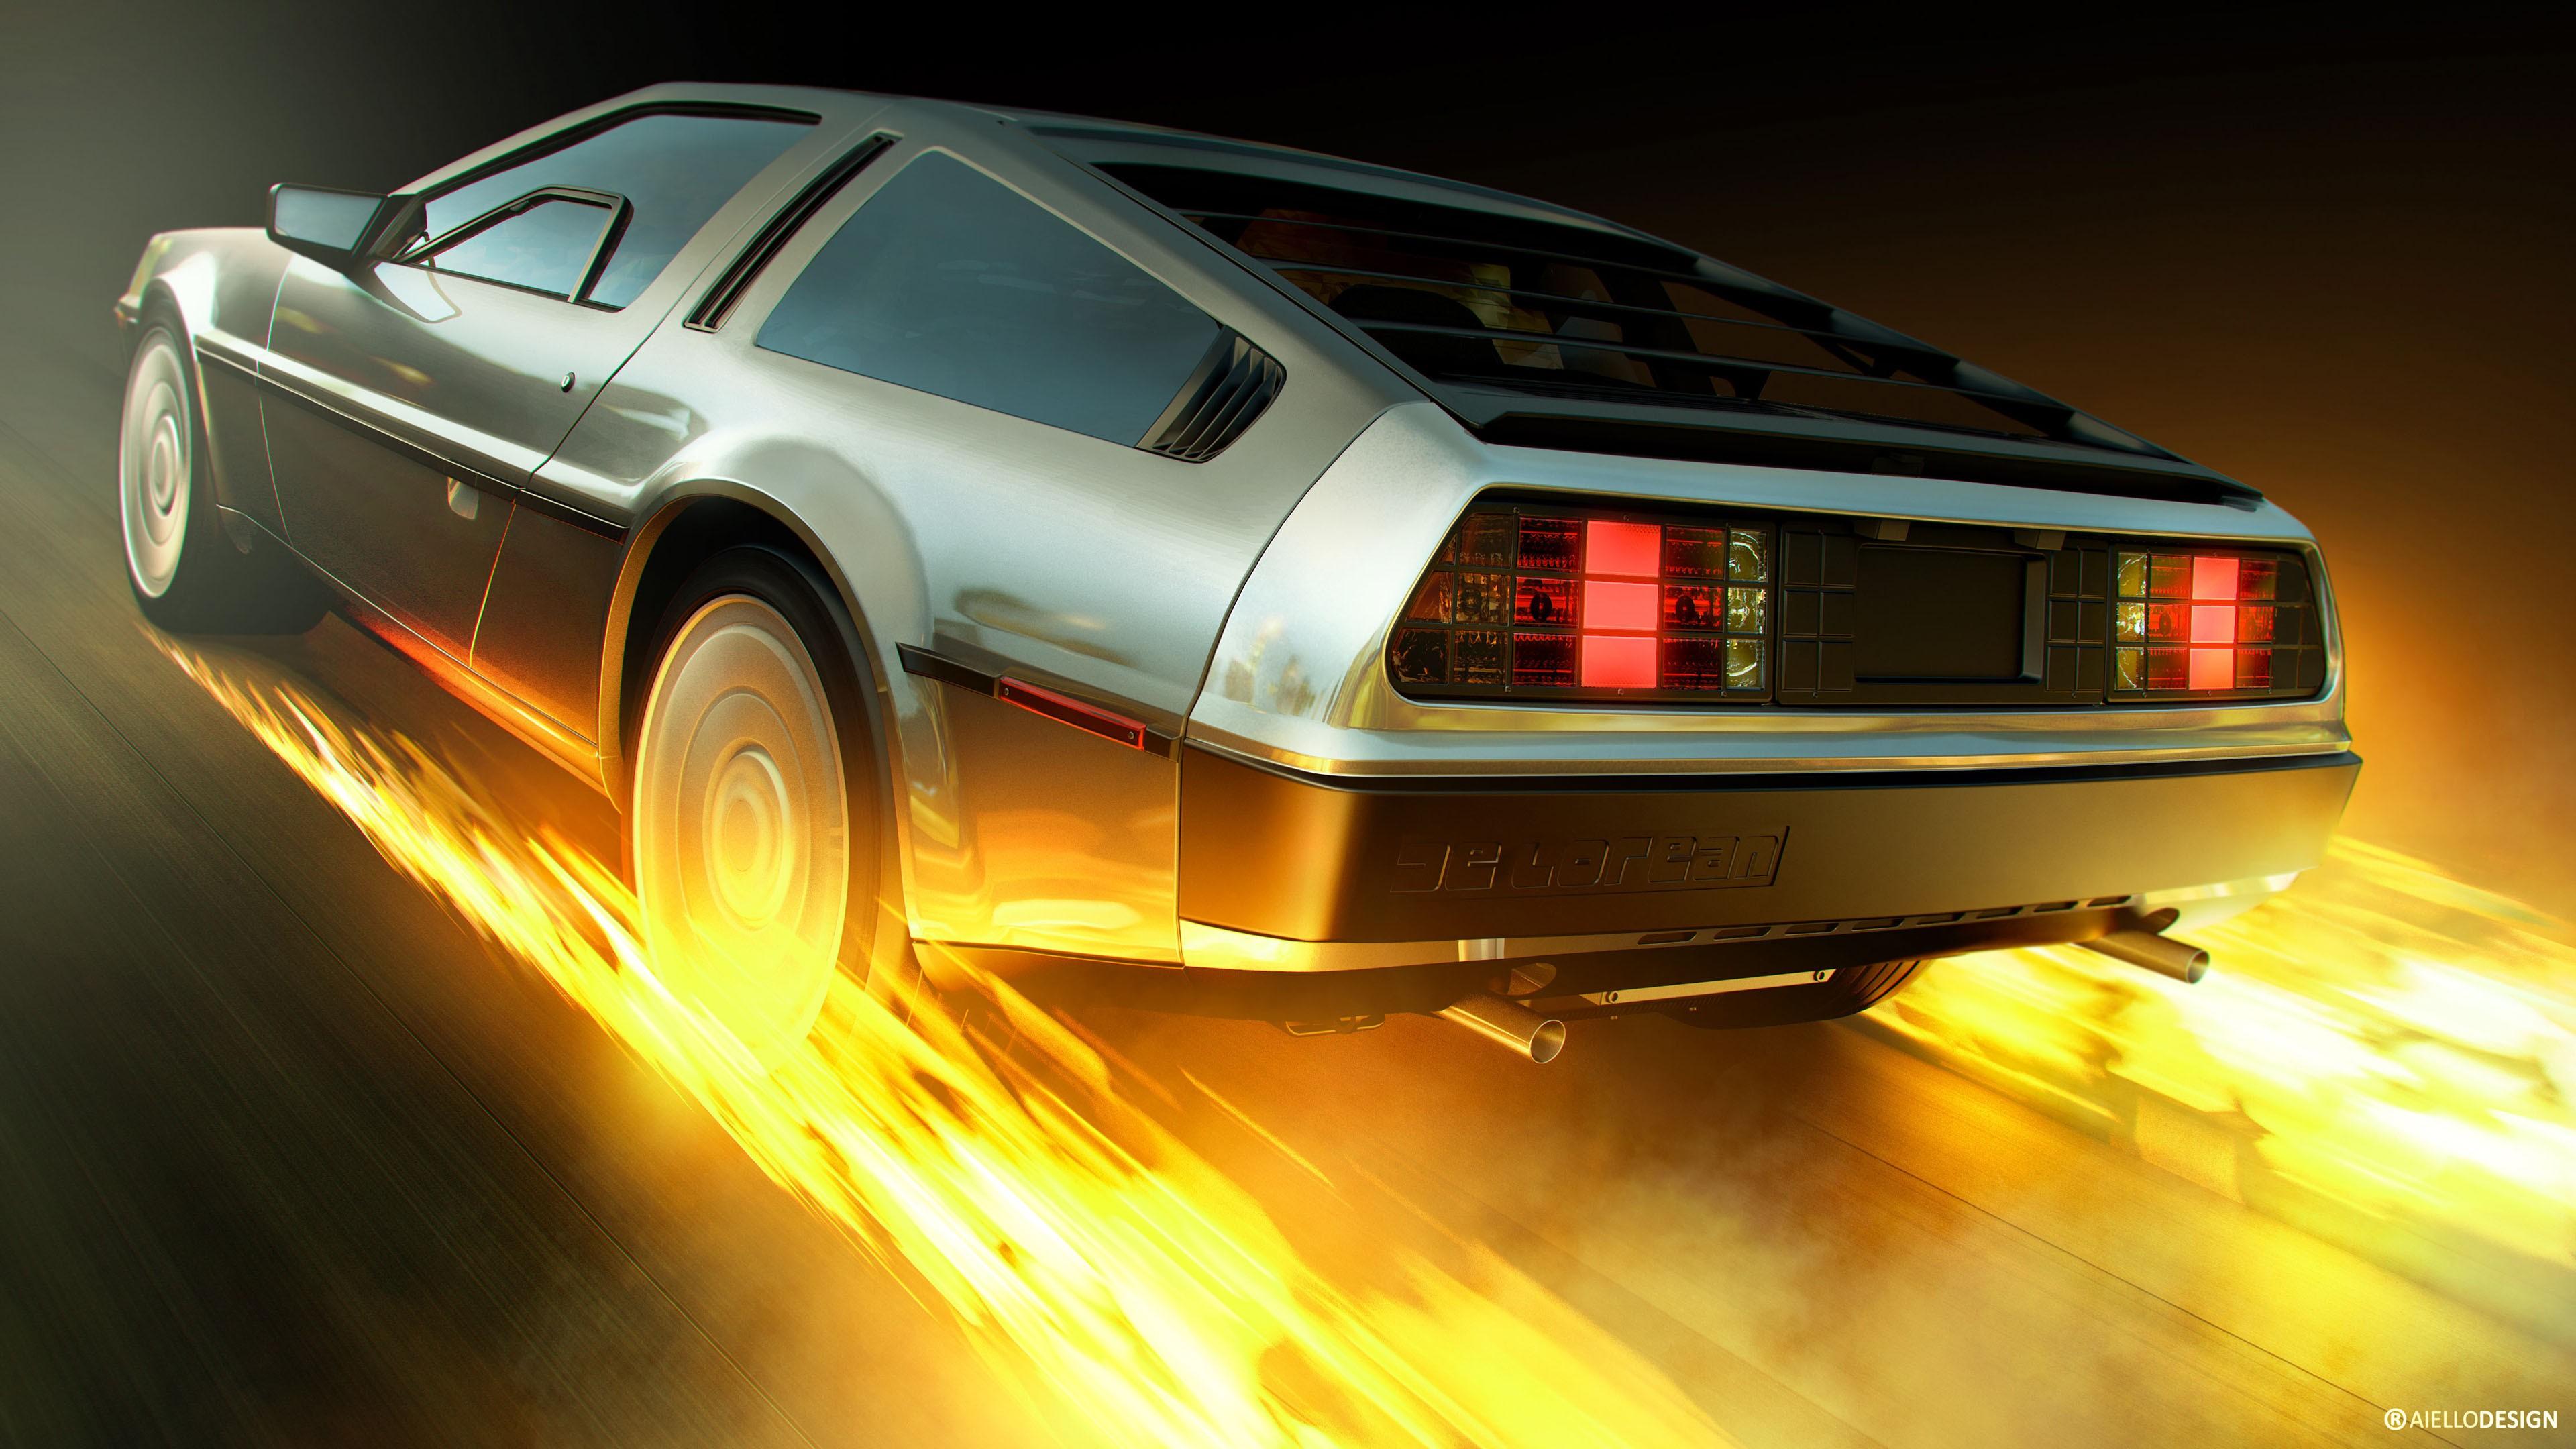 Back To The Future Delorean 4k Wallpaper Hd Car Wallpapers Id 8033